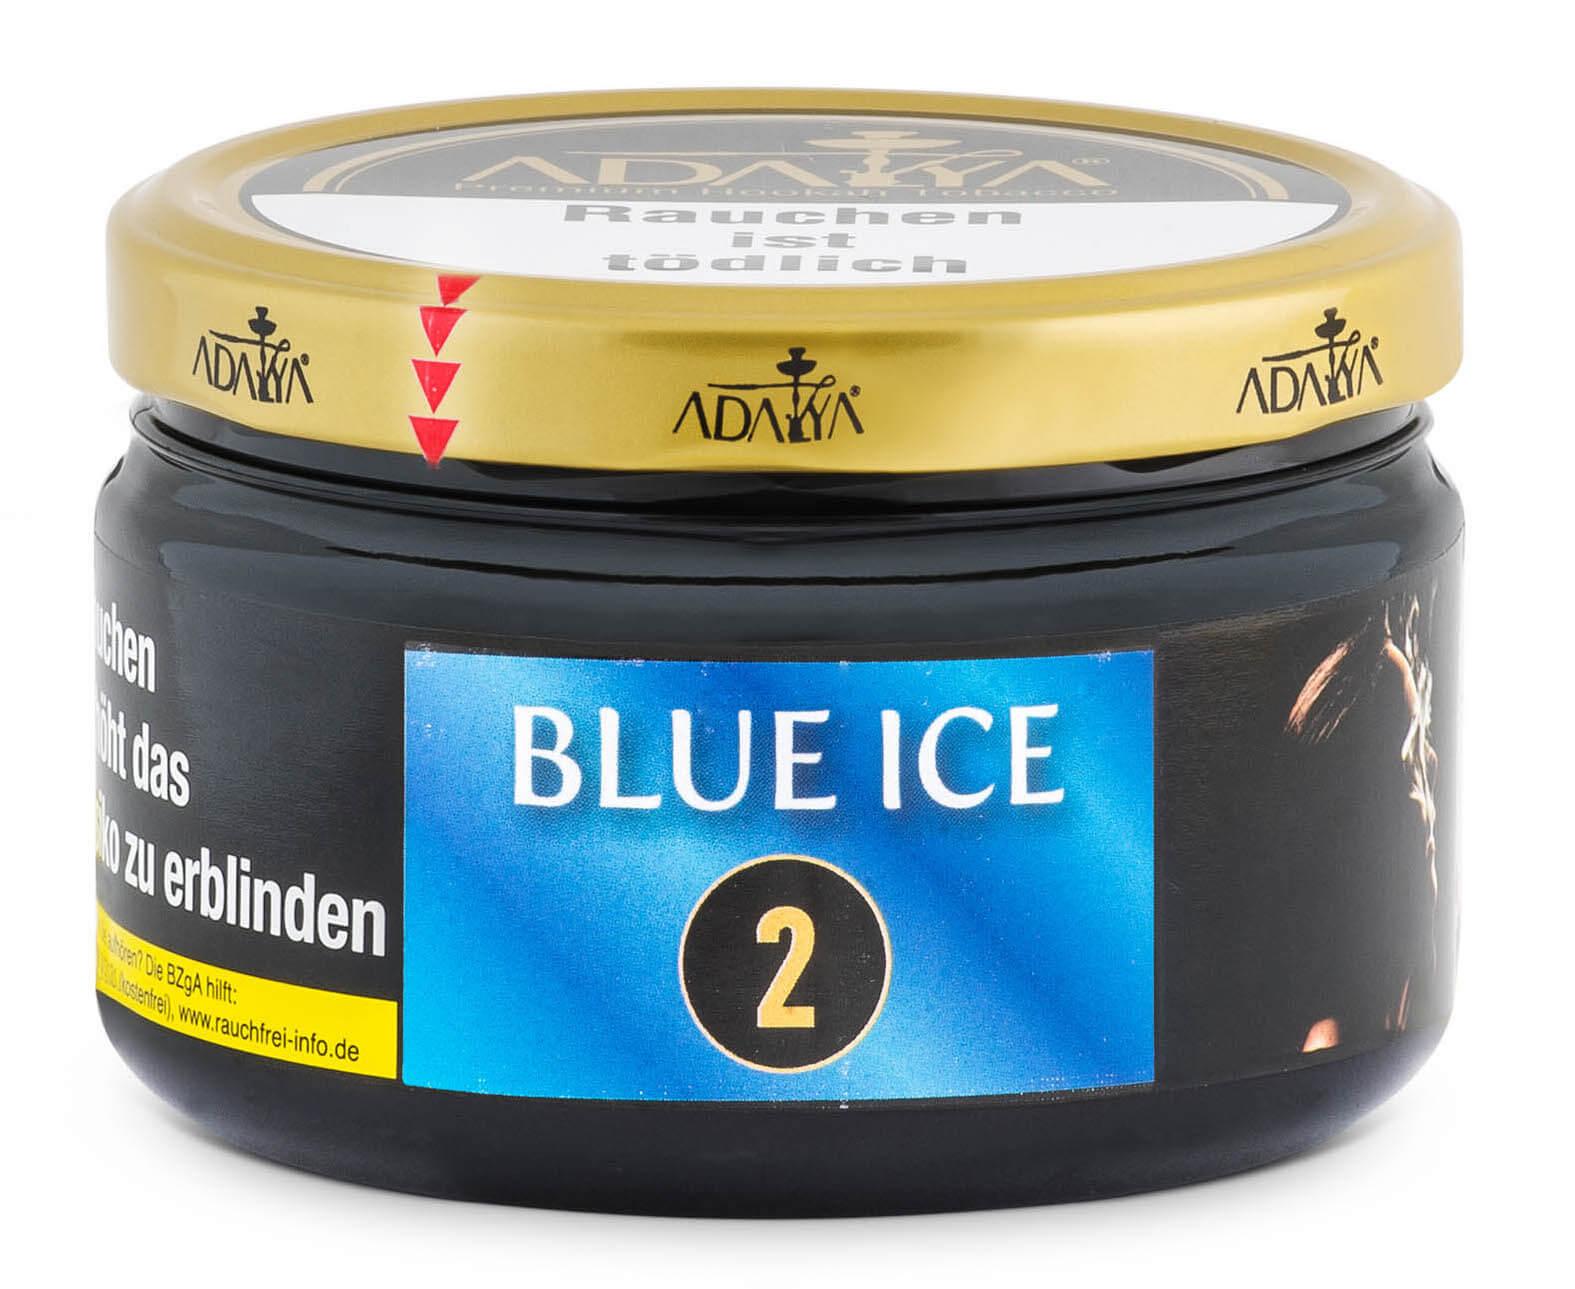 Adalya Tabak Blue Ice #2 200g